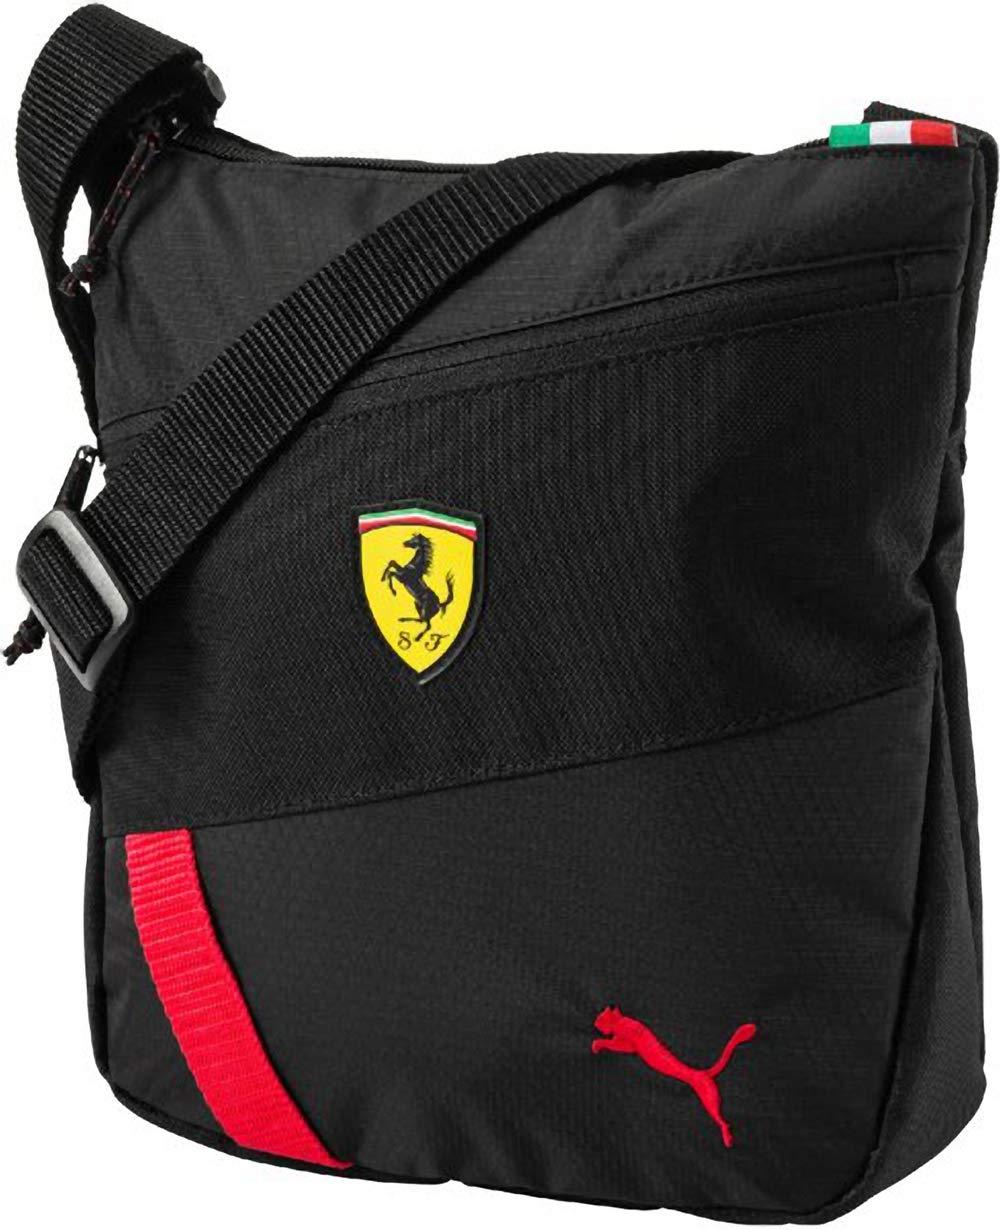 Bandolera Puma Ferrari Negra